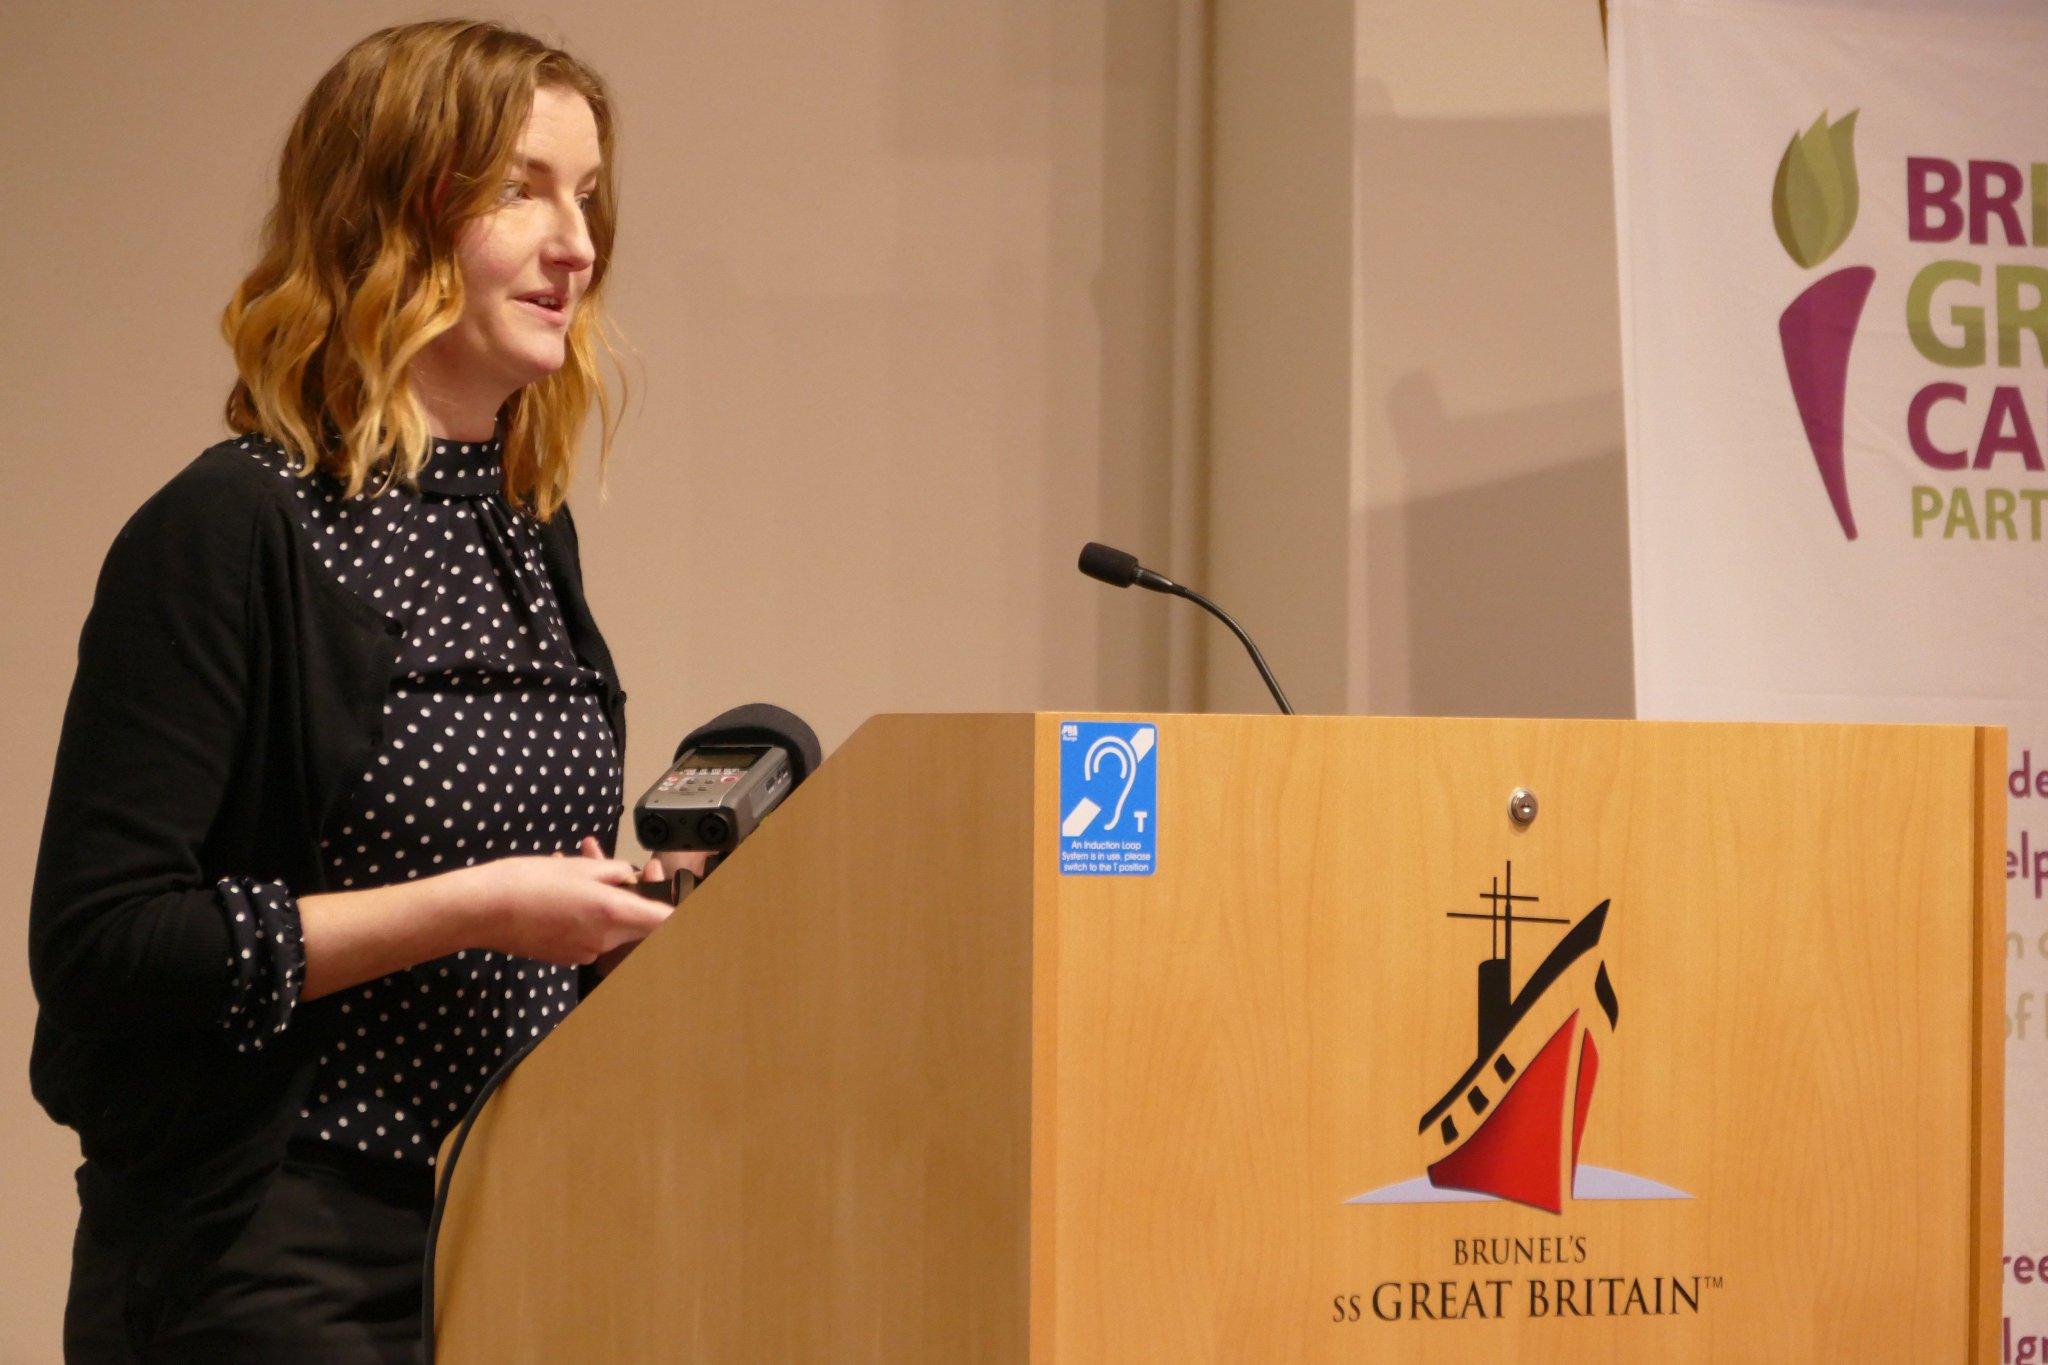 Shelly Dewhurst @WoENP presenting on restoration of natural environment across West of England through #green #infrastructure #BGCPGathering https://t.co/j0mTivJduT